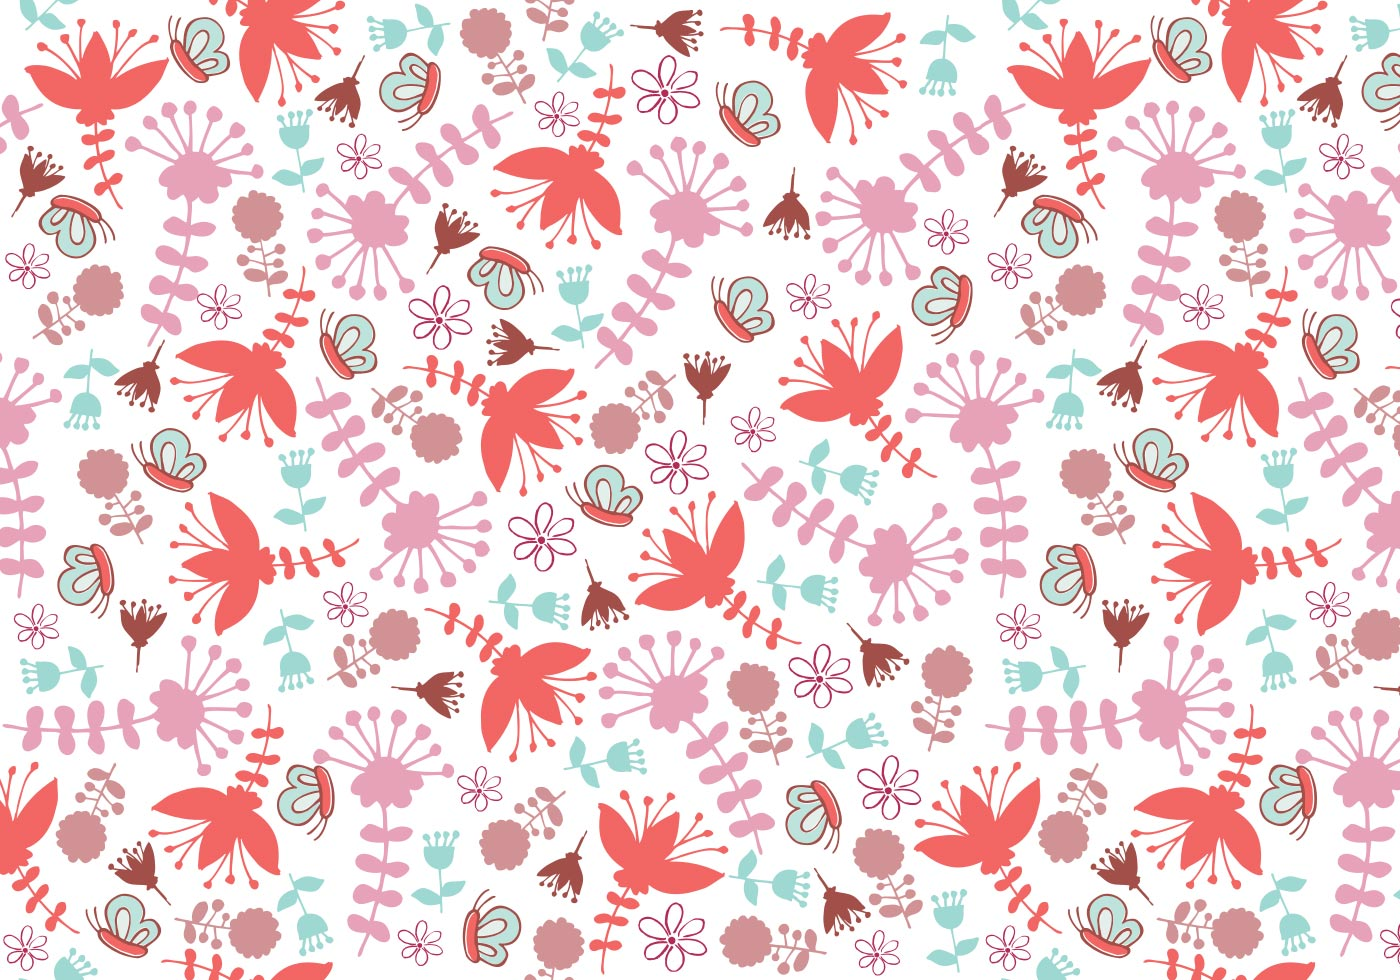 whimsical floral illustrator pattern